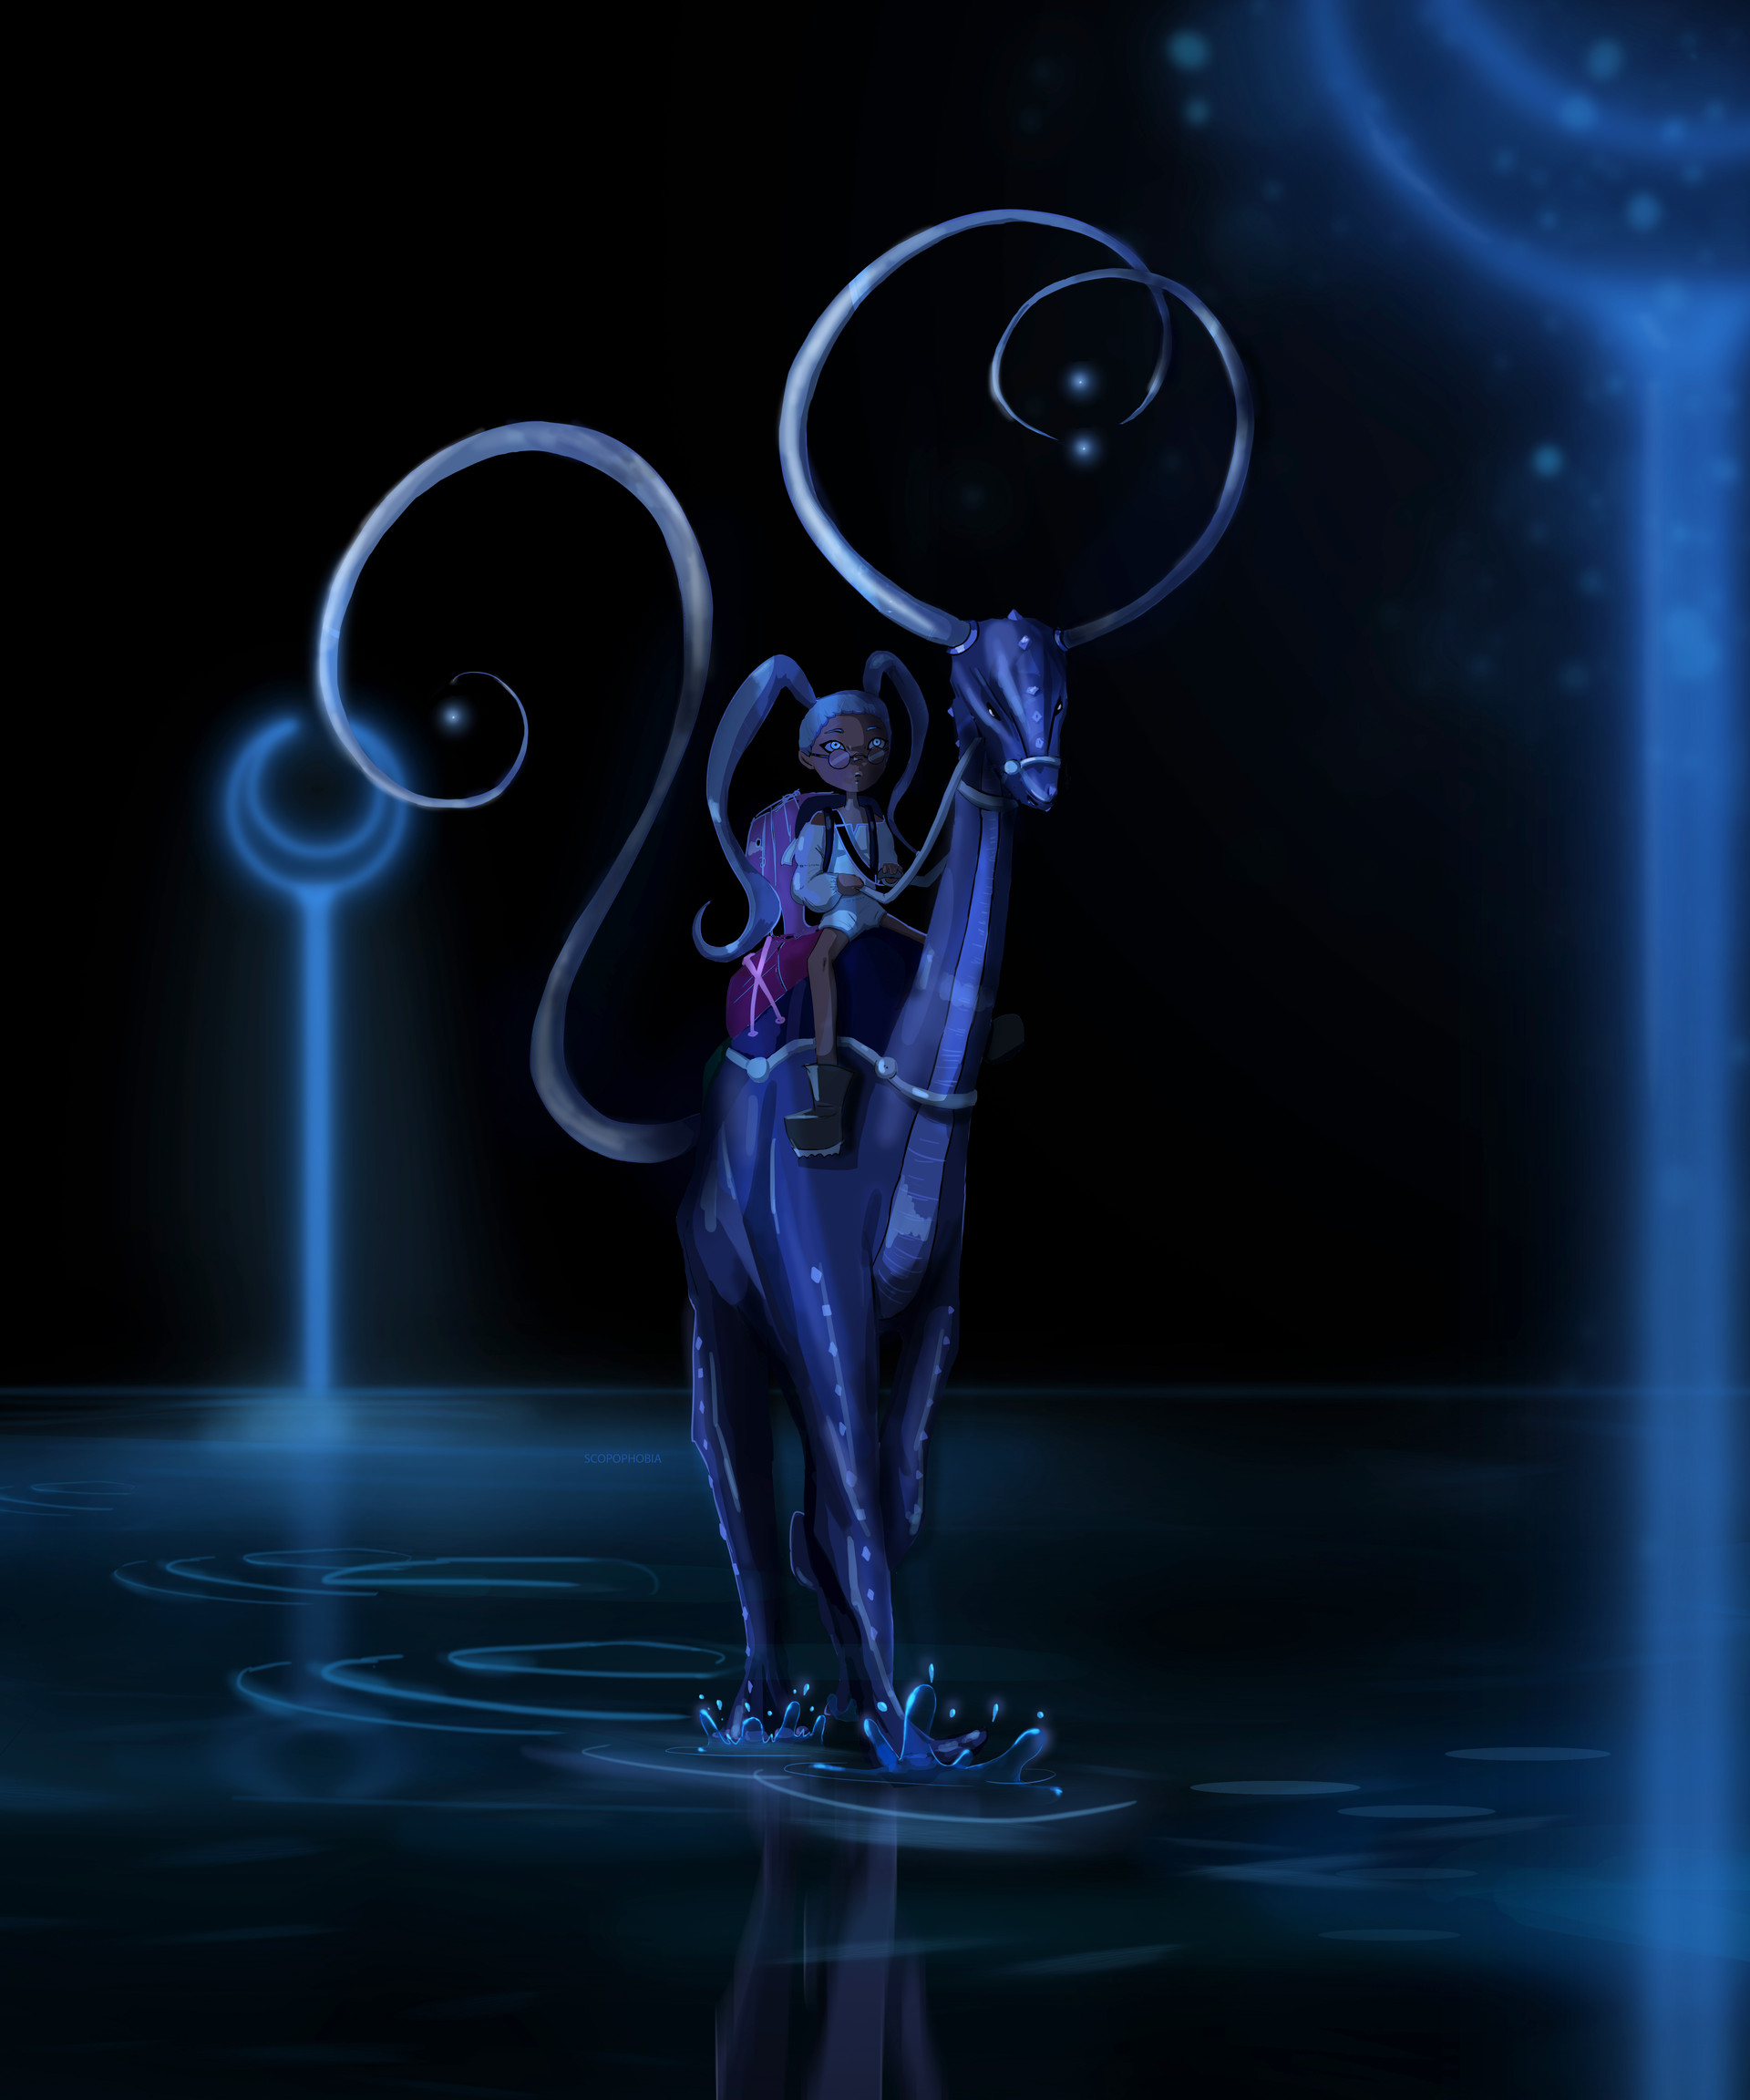 Moonwalker-Concept Art for Alex in Carrotland